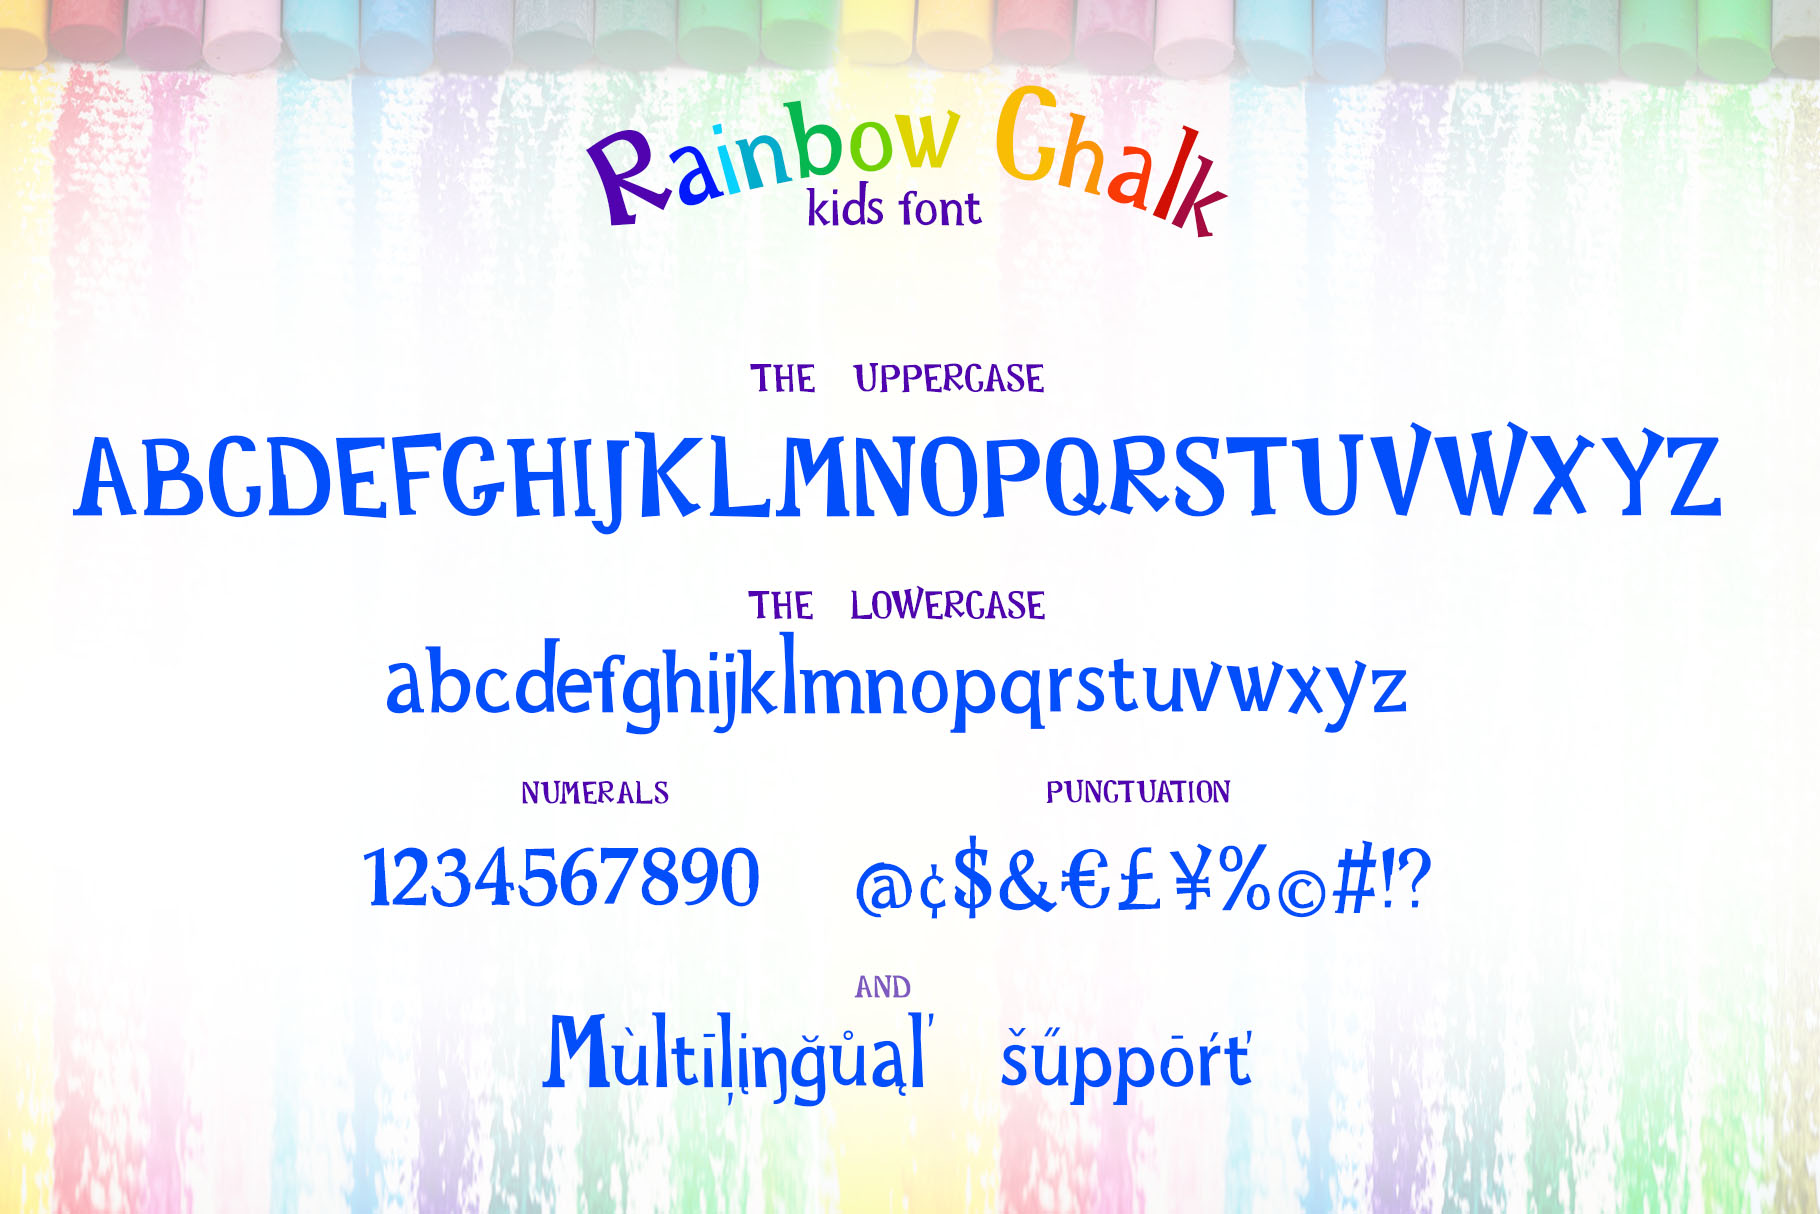 Rainbow Chalk fun kids font example image 2